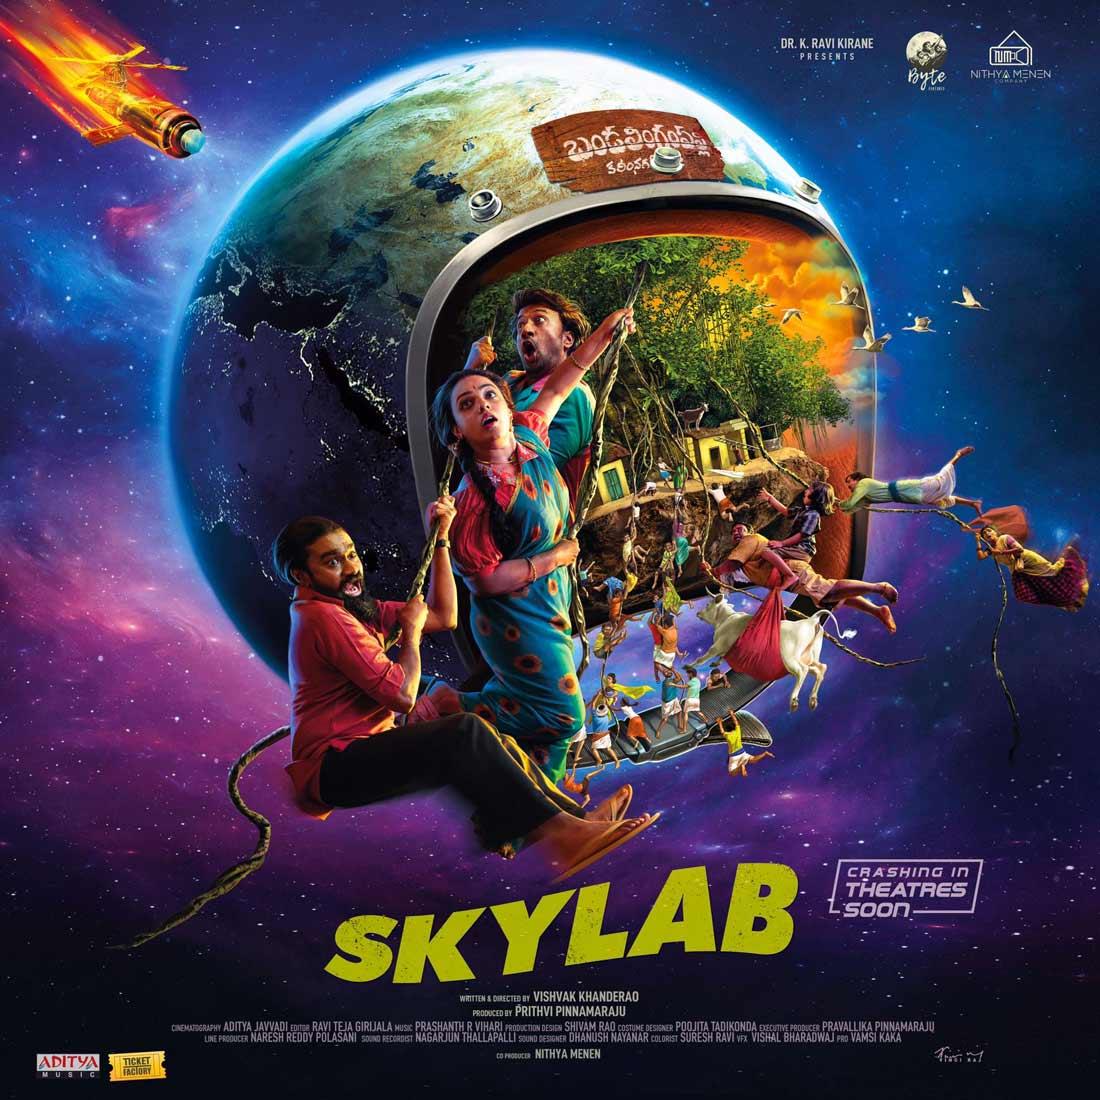 skylab movie,sathyadev,nithya minan,rahul ramakrishna,viswak khanderao  స్కైలాబ్.. త్వరలోనే థియేటర్స్లో